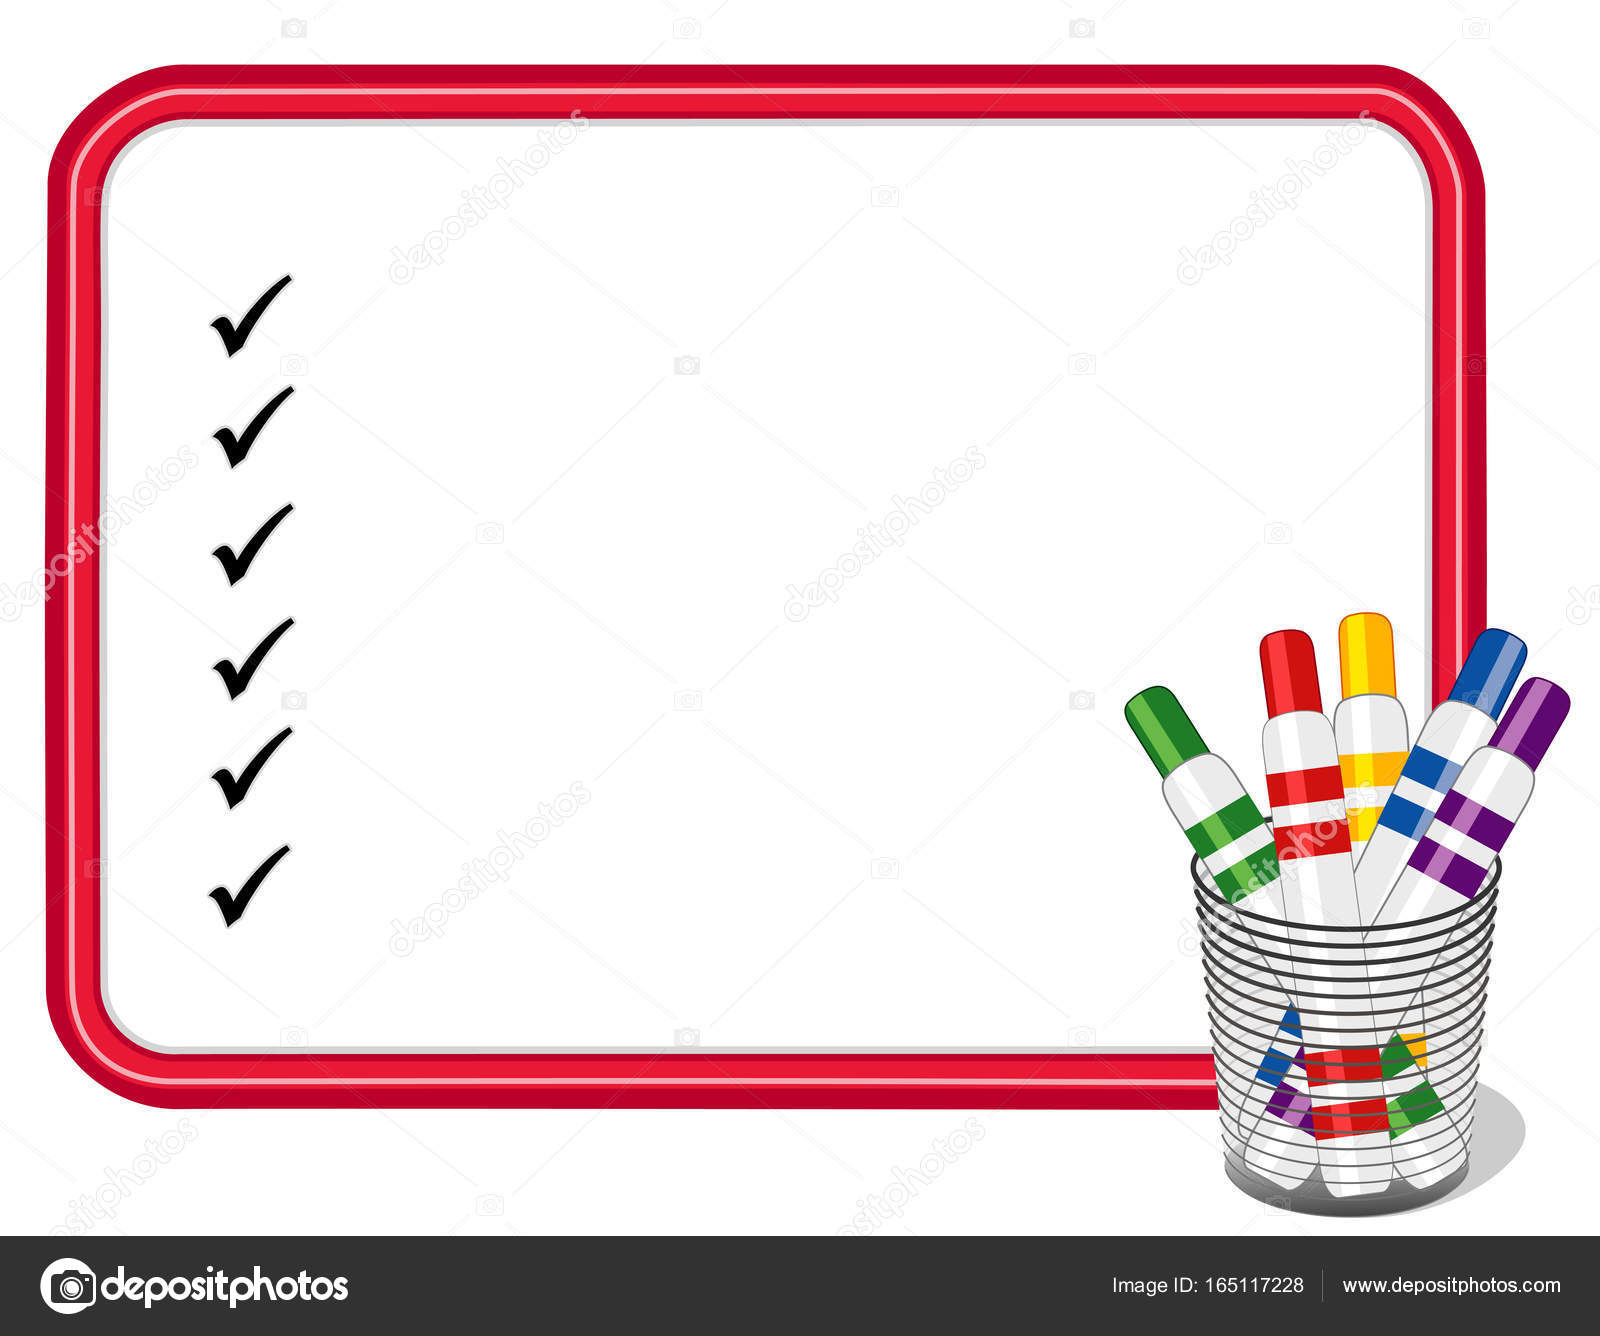 whiteboard checklist with marker pens in desk organizer copy space